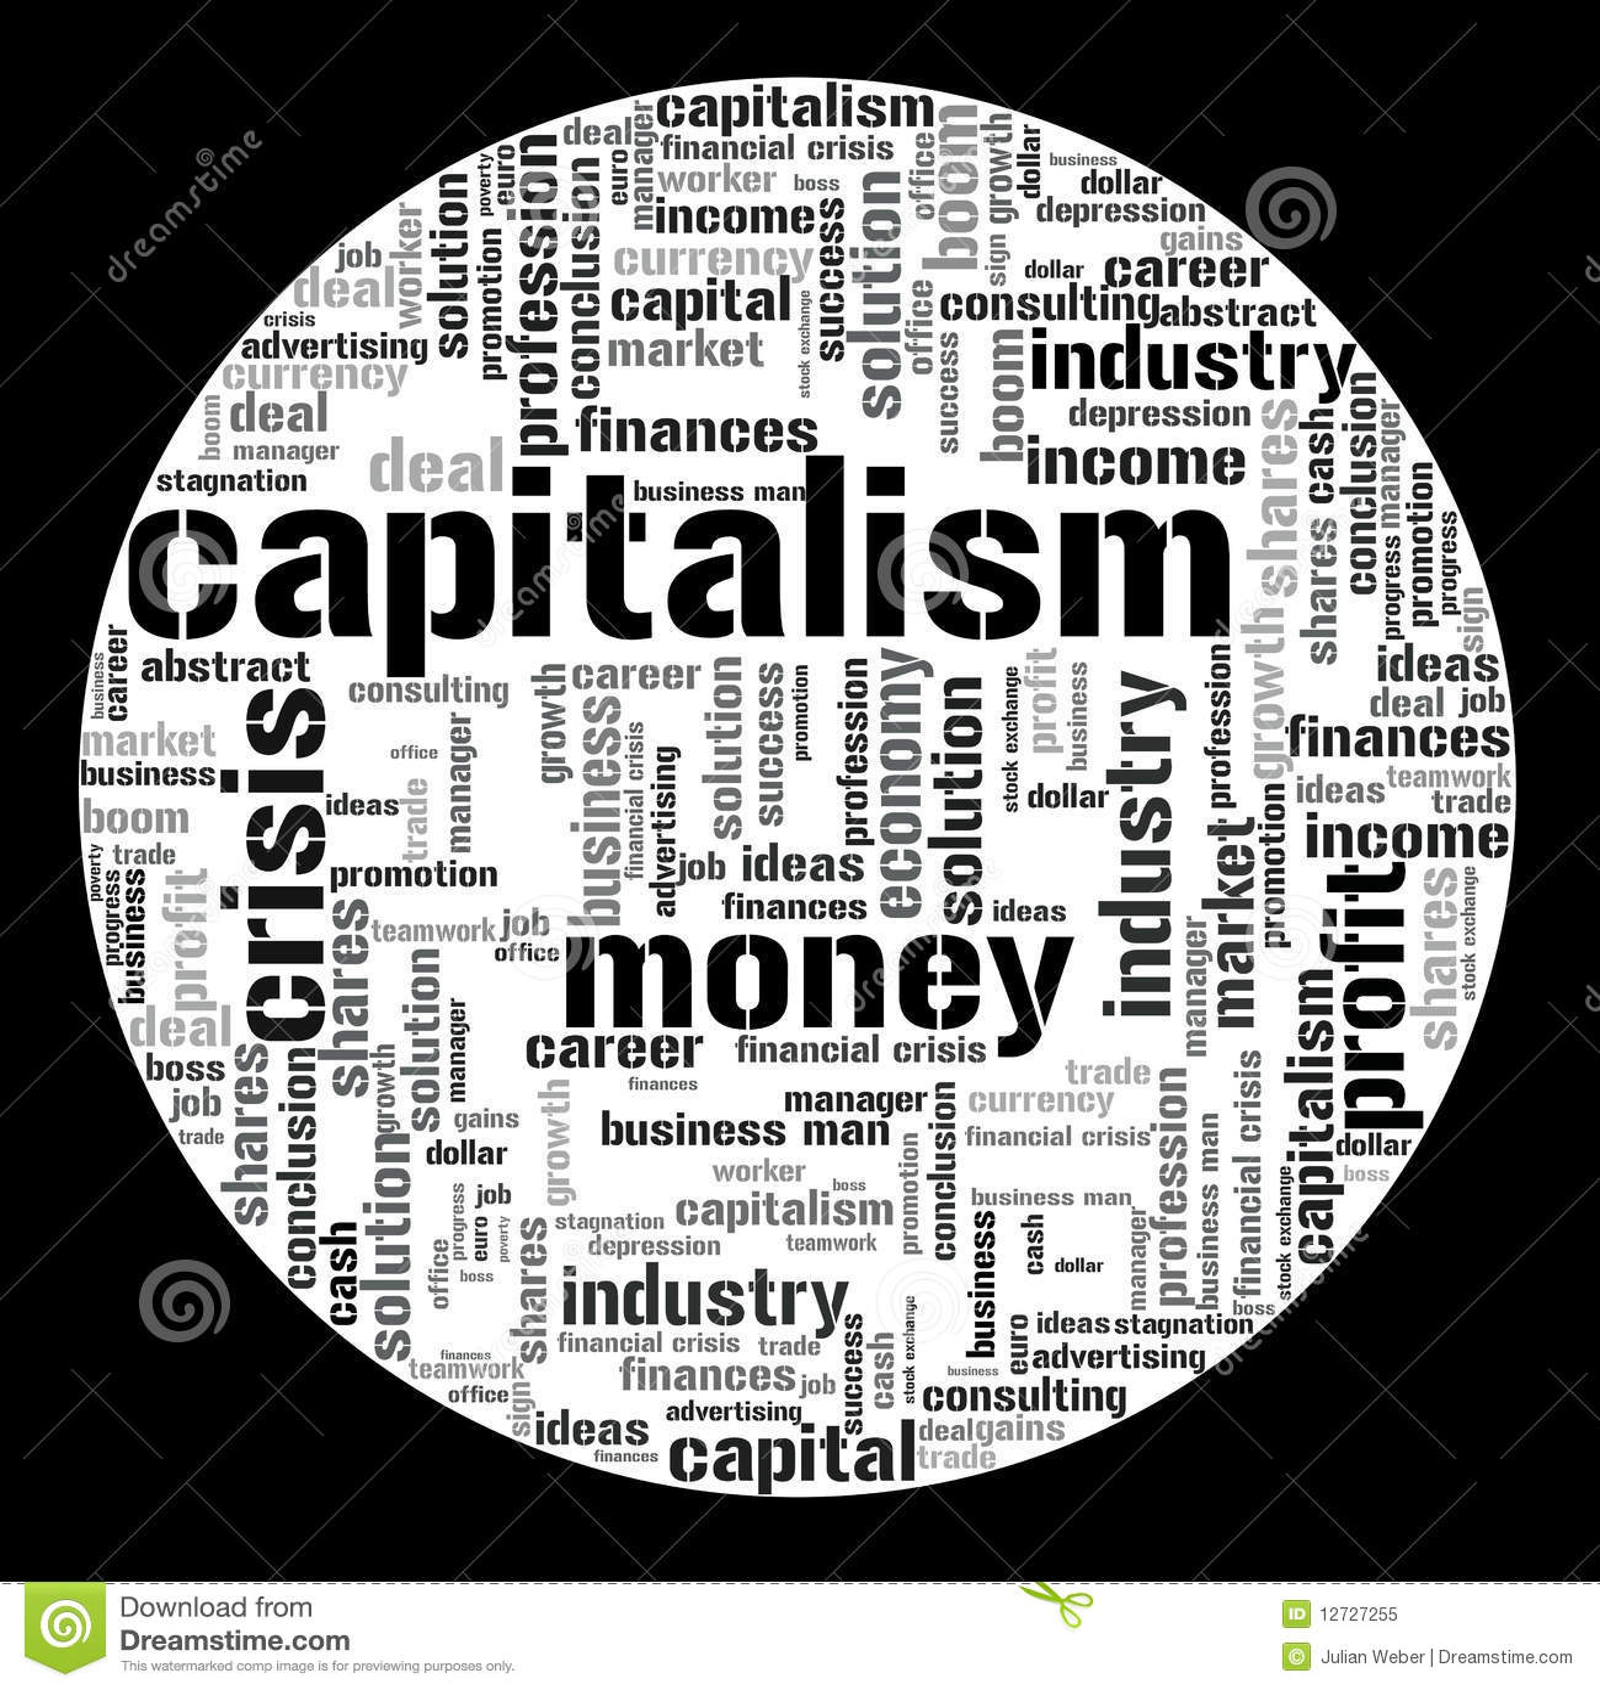 economics terms quizlet Economics chapter 4 study online at quizletcom/_9e24o title: print economics chapter 4 | quizlet | quizlet created date: 20130307134754z.